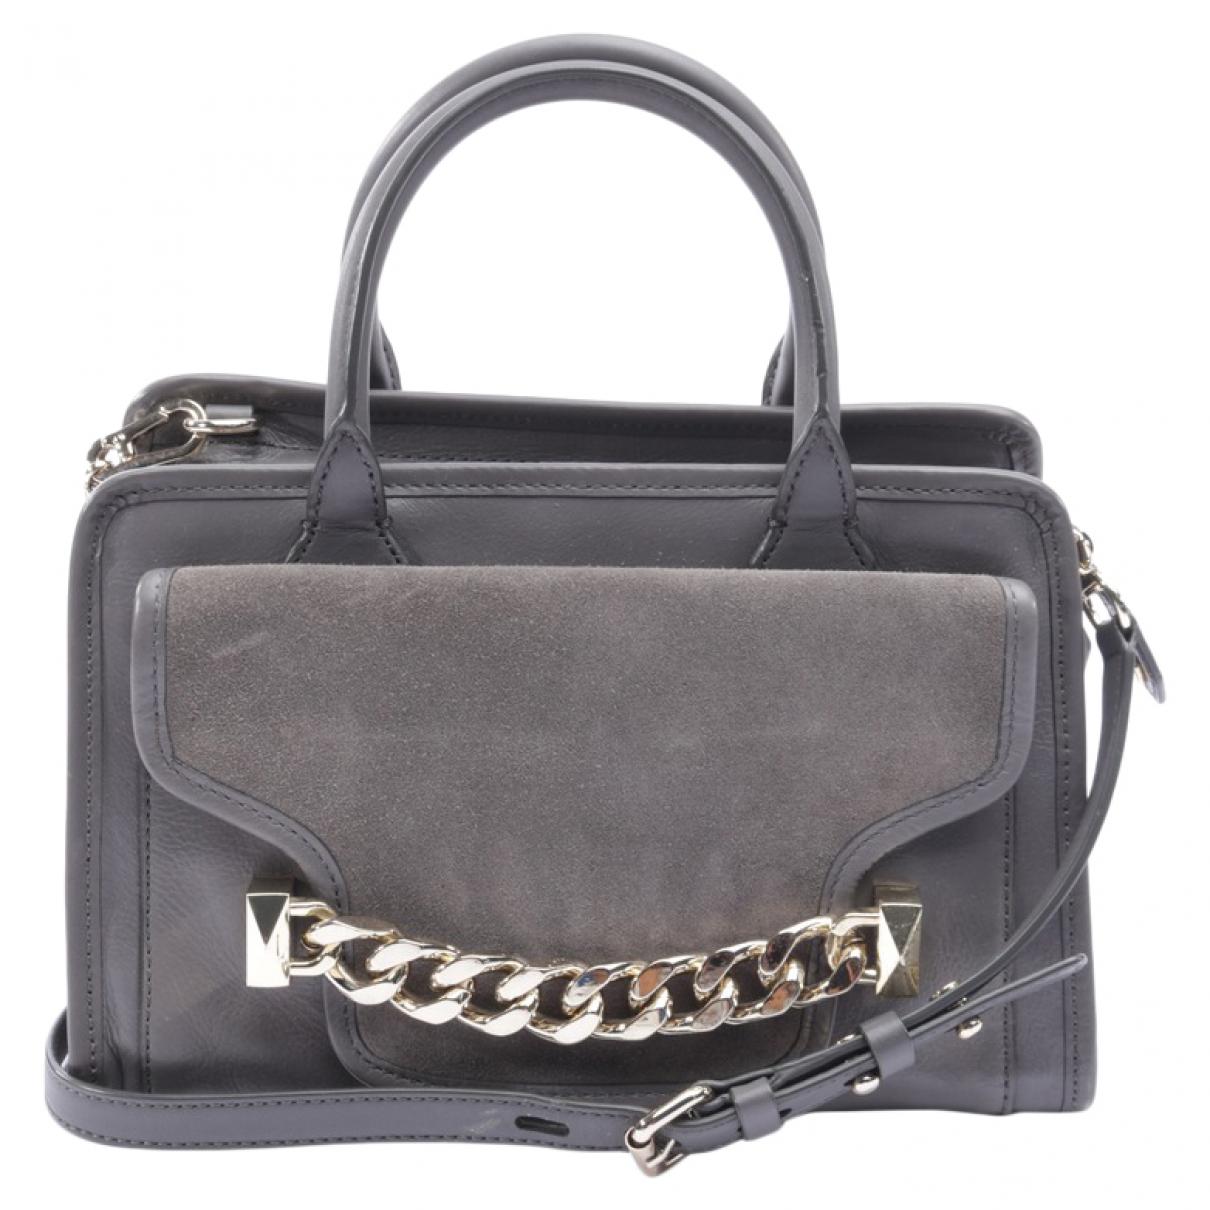 Karl Lagerfeld \N Grey Leather handbag for Women \N